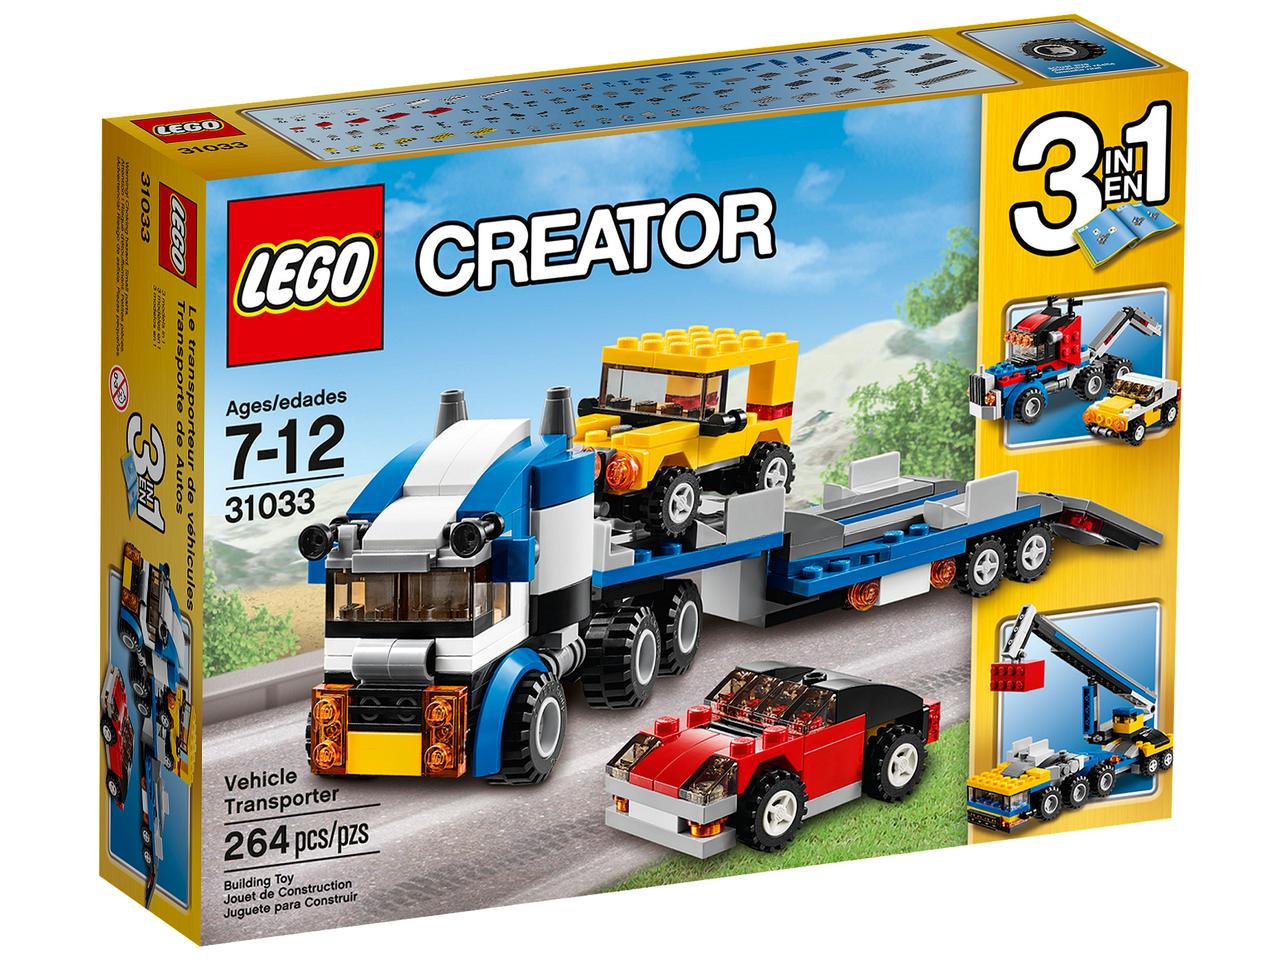 31033 Lego Creator Автотранспортер, Лего Креатор